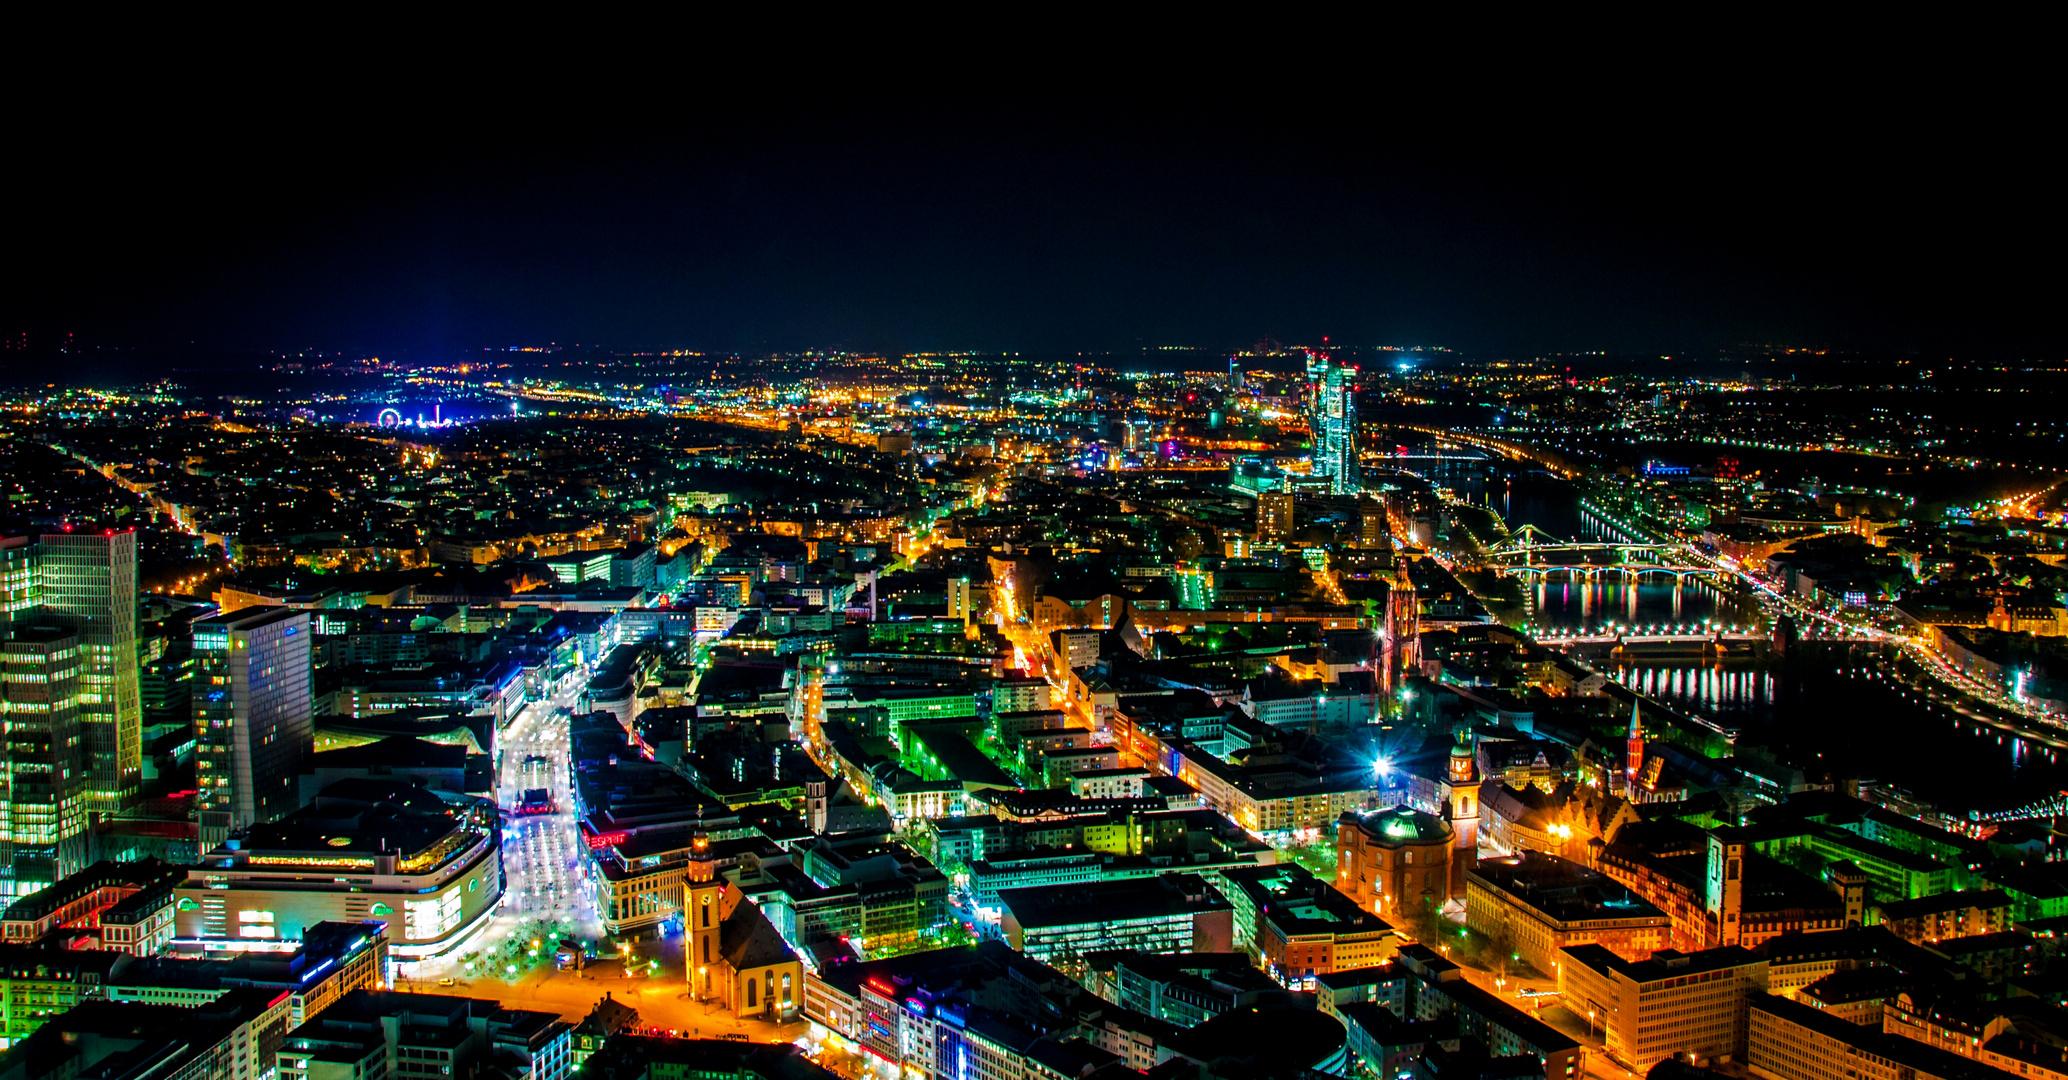 Franfurt Nacht 1